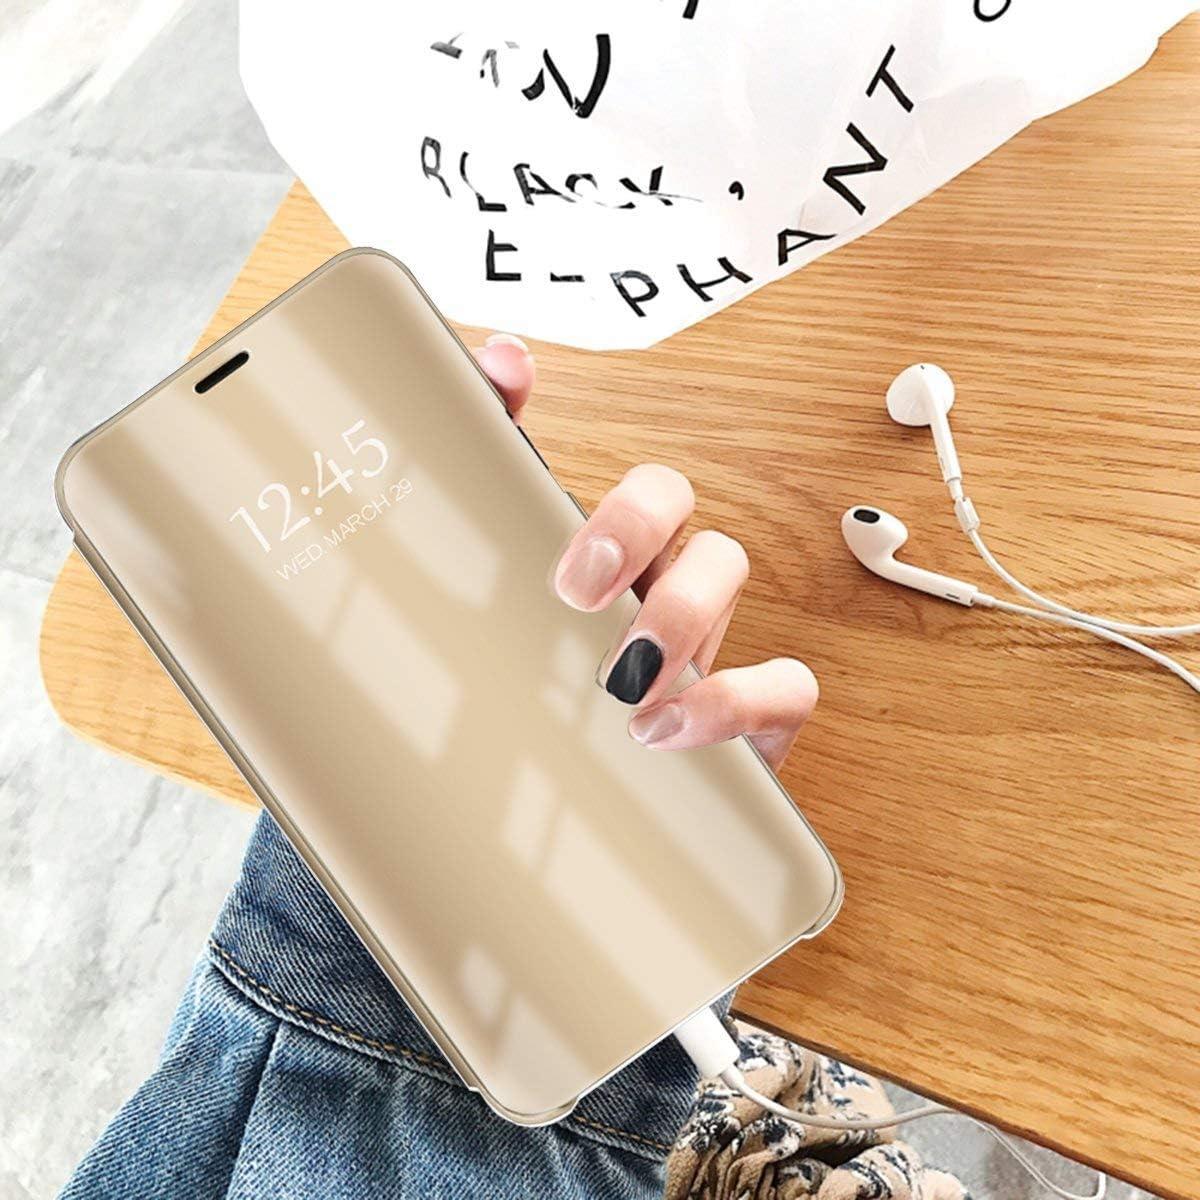 Caler Cover Compatible avec Samsung Galaxy A520//A5 2017 Miroir Coque Intelligente Portefeuille Flip Silicone Transparent Case en Cuir Bumper Folio Protecteur Couverture Mirror Support Shell